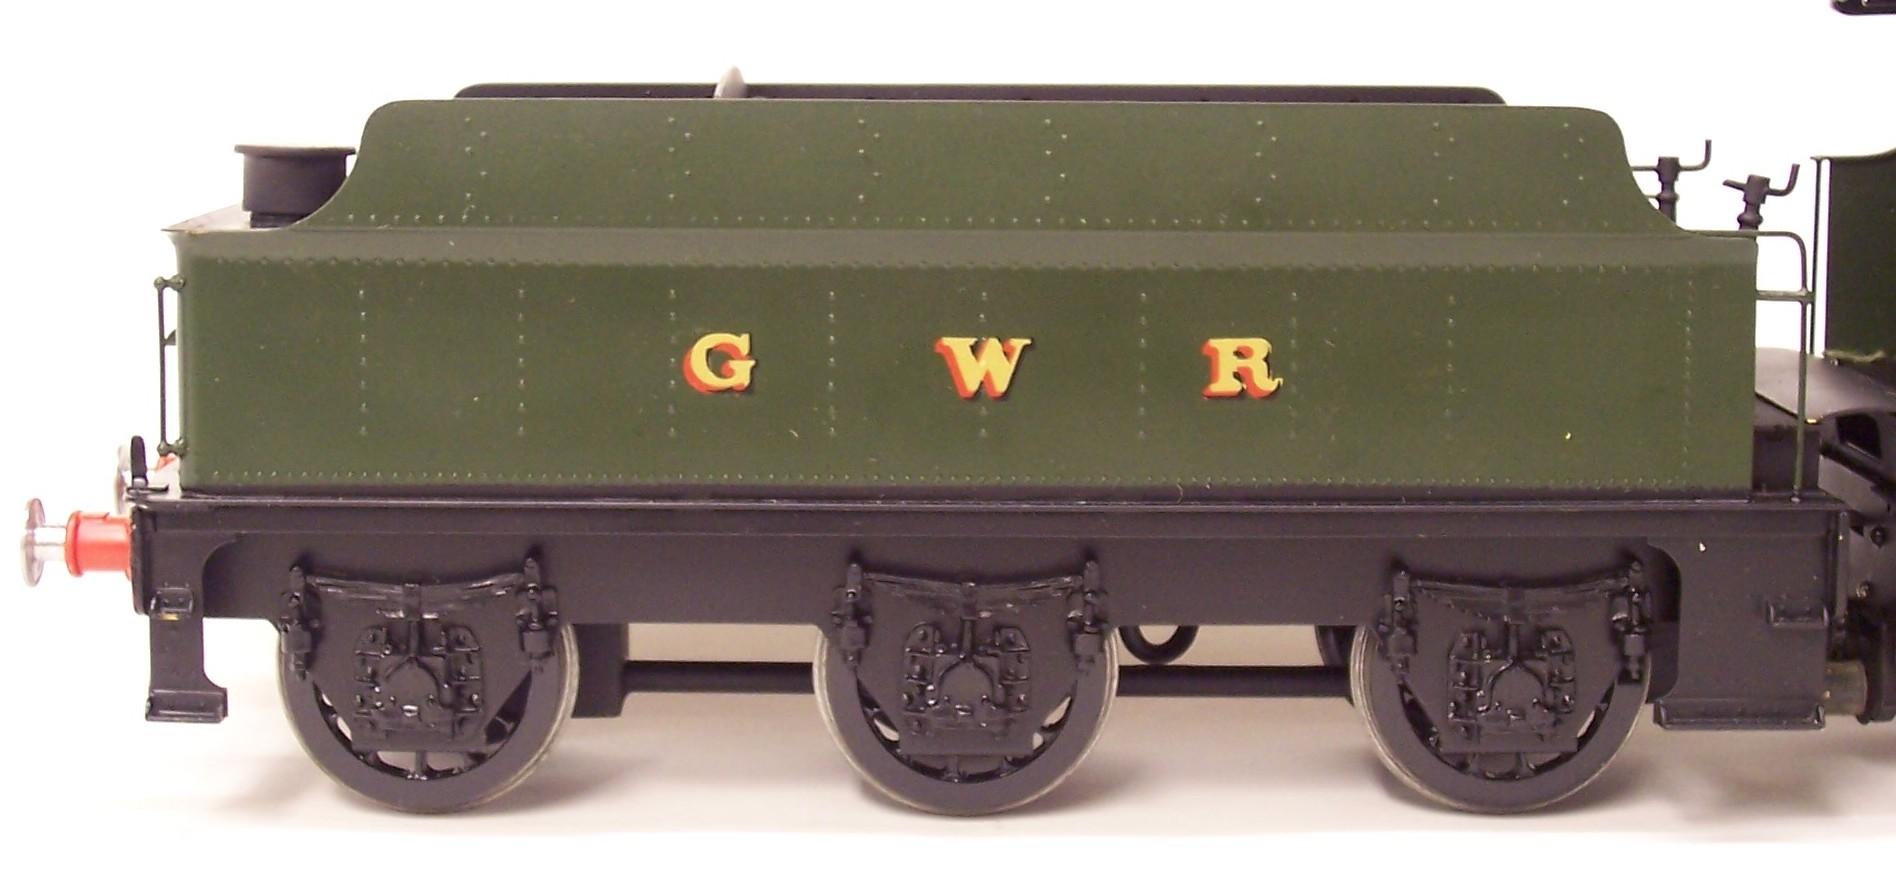 GW3500